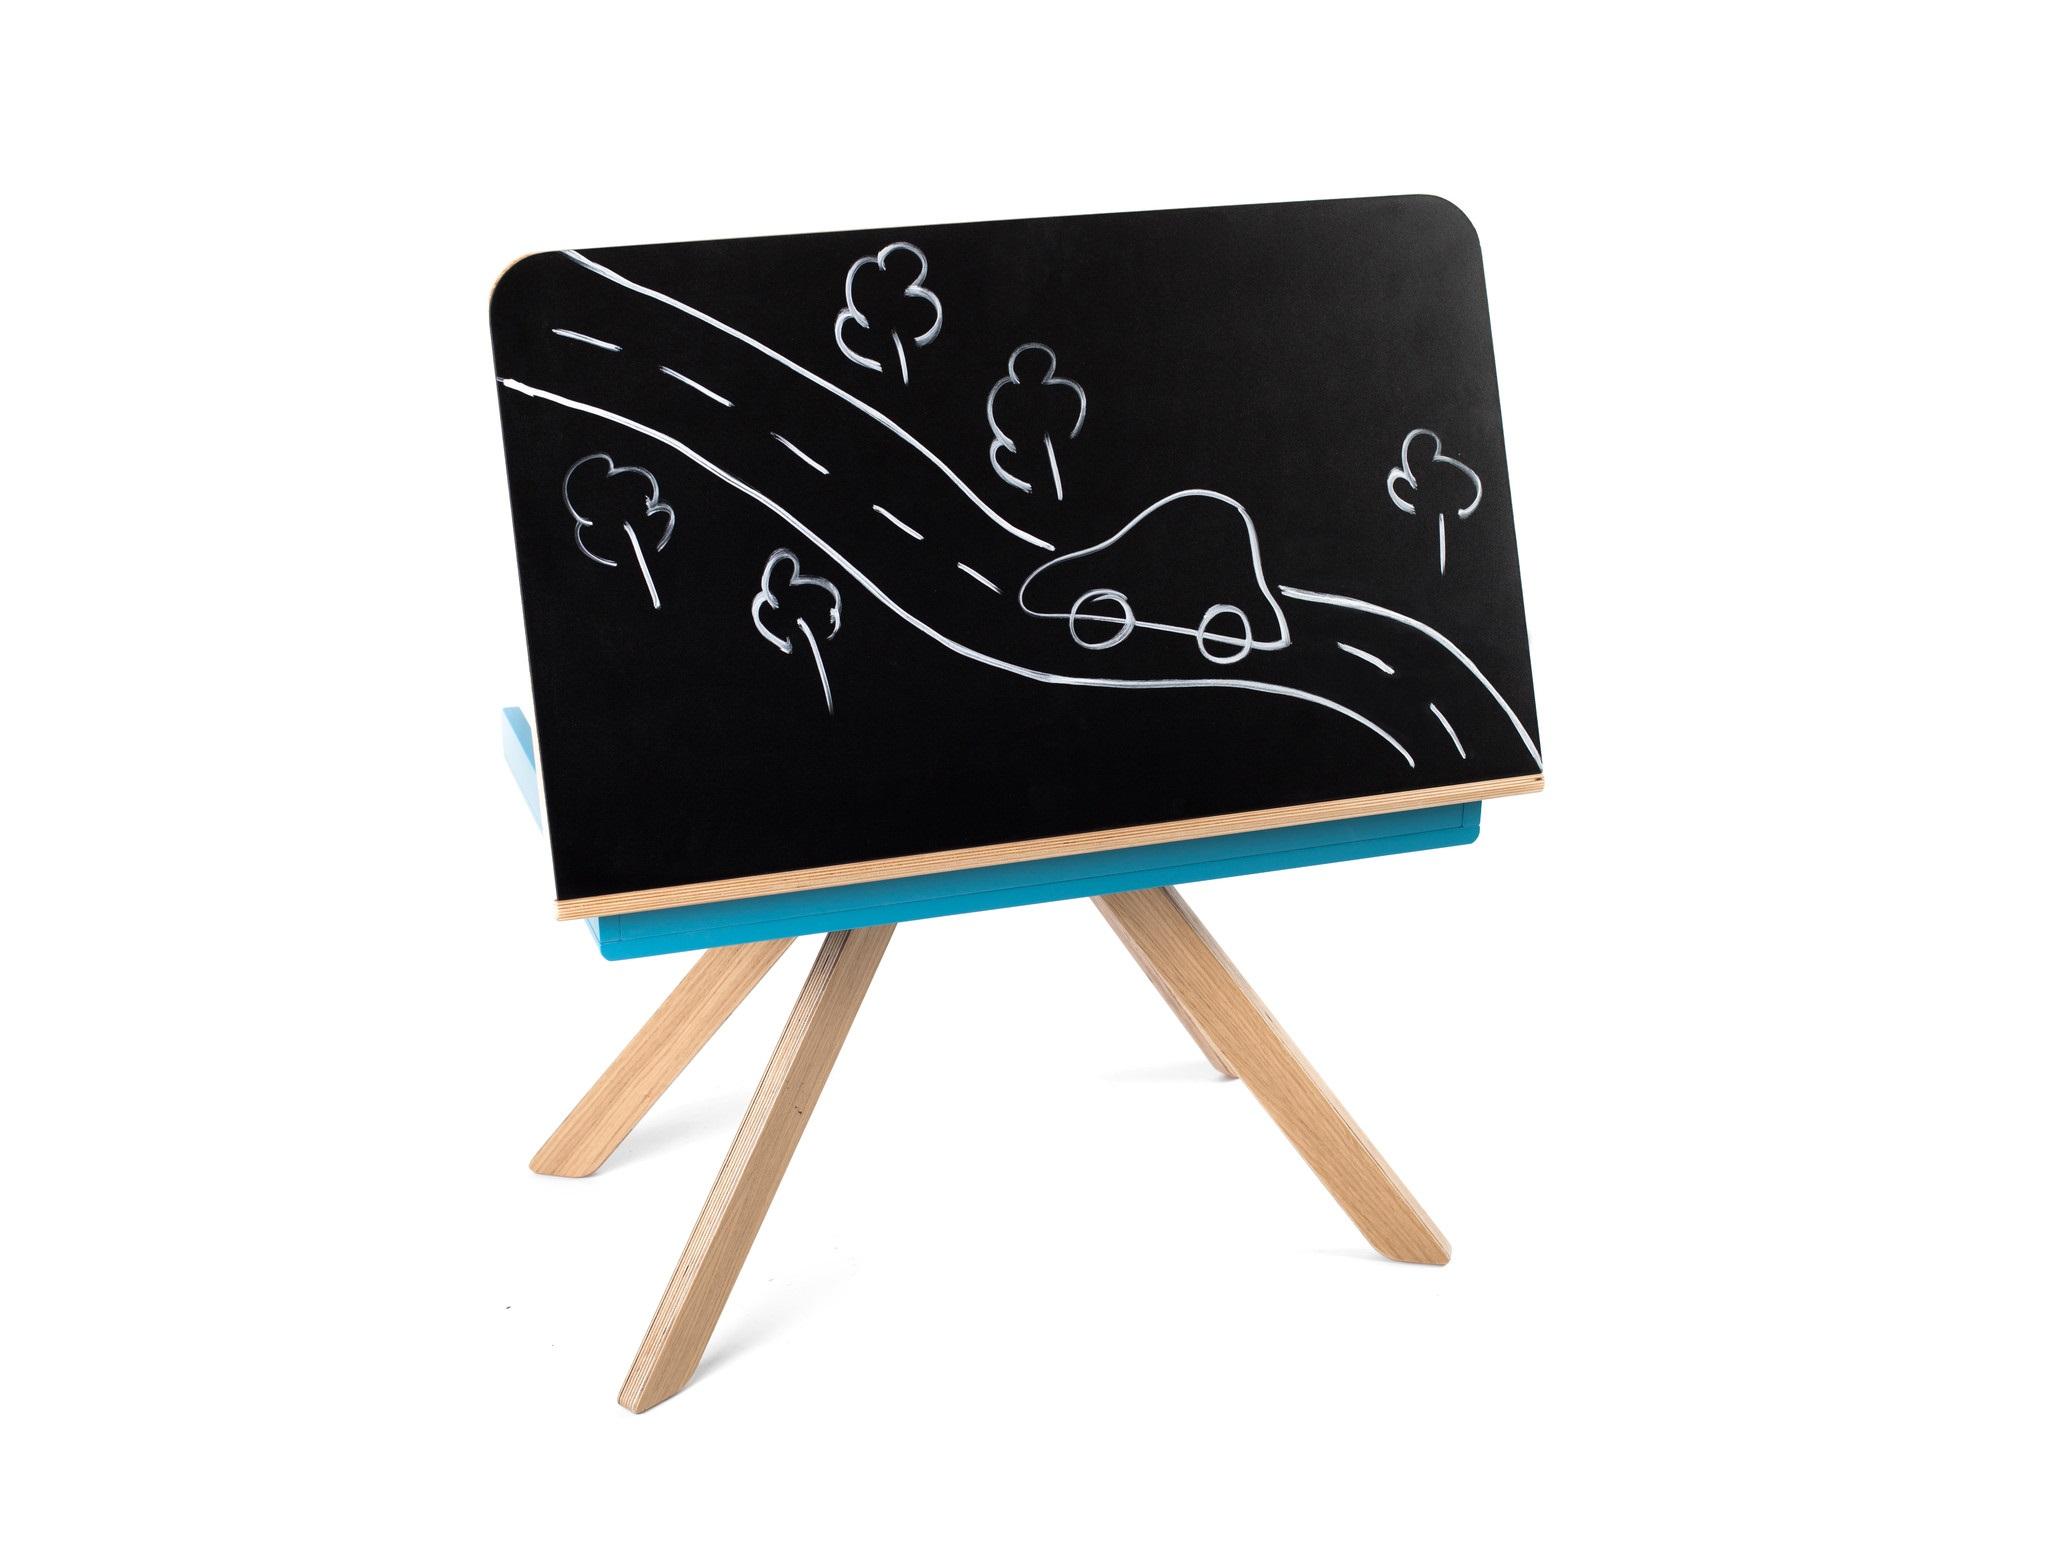 Грифельная доска MalevichДругое<br><br><br>Material: МДФ<br>Ширина см: 82<br>Высота см: 50